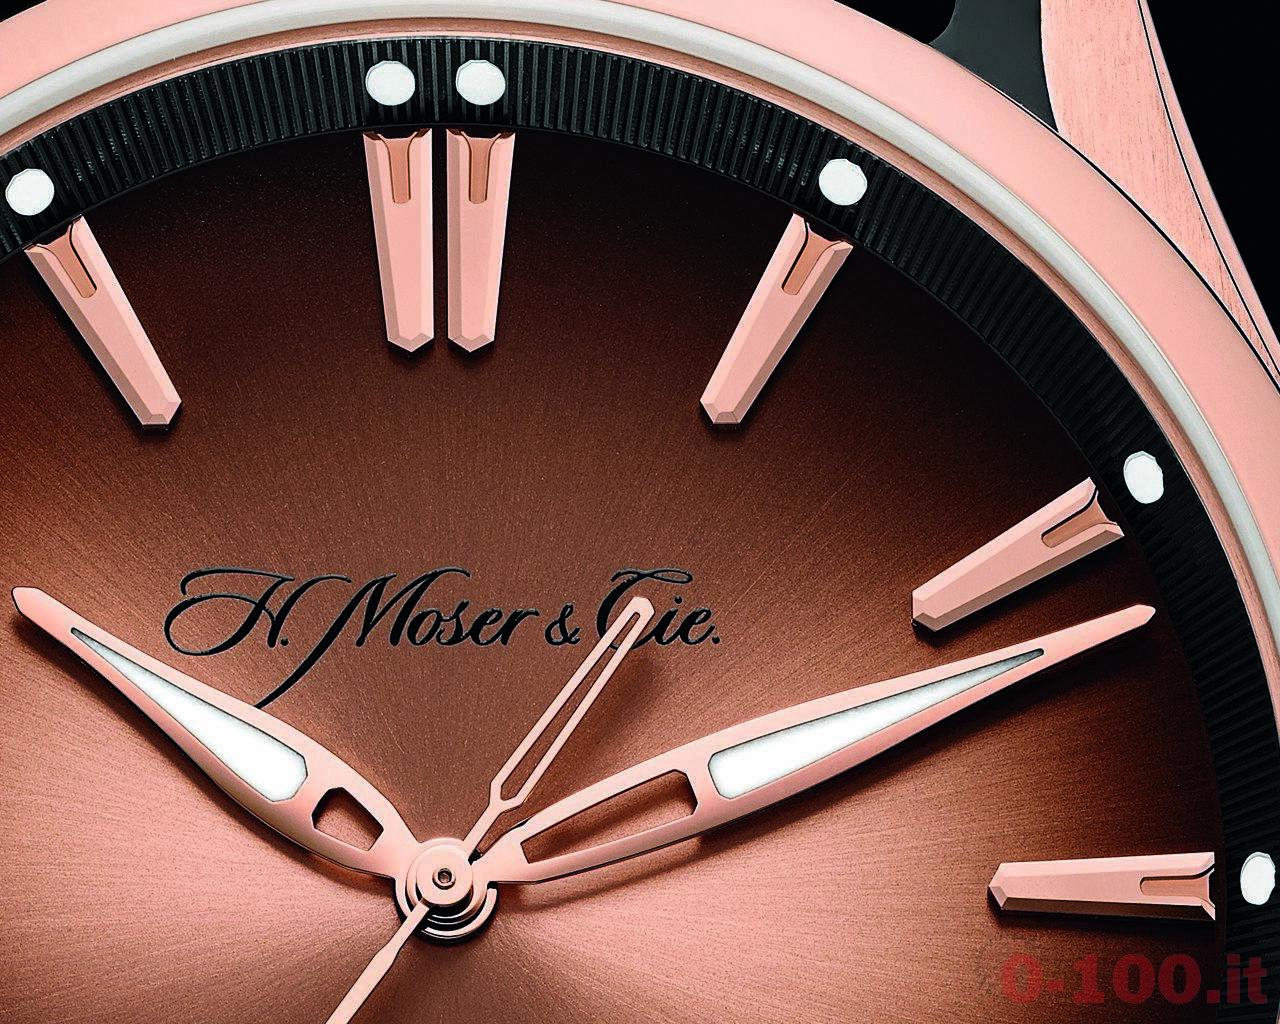 h-moser-cie-pioneer-centre-seconds_0-1005